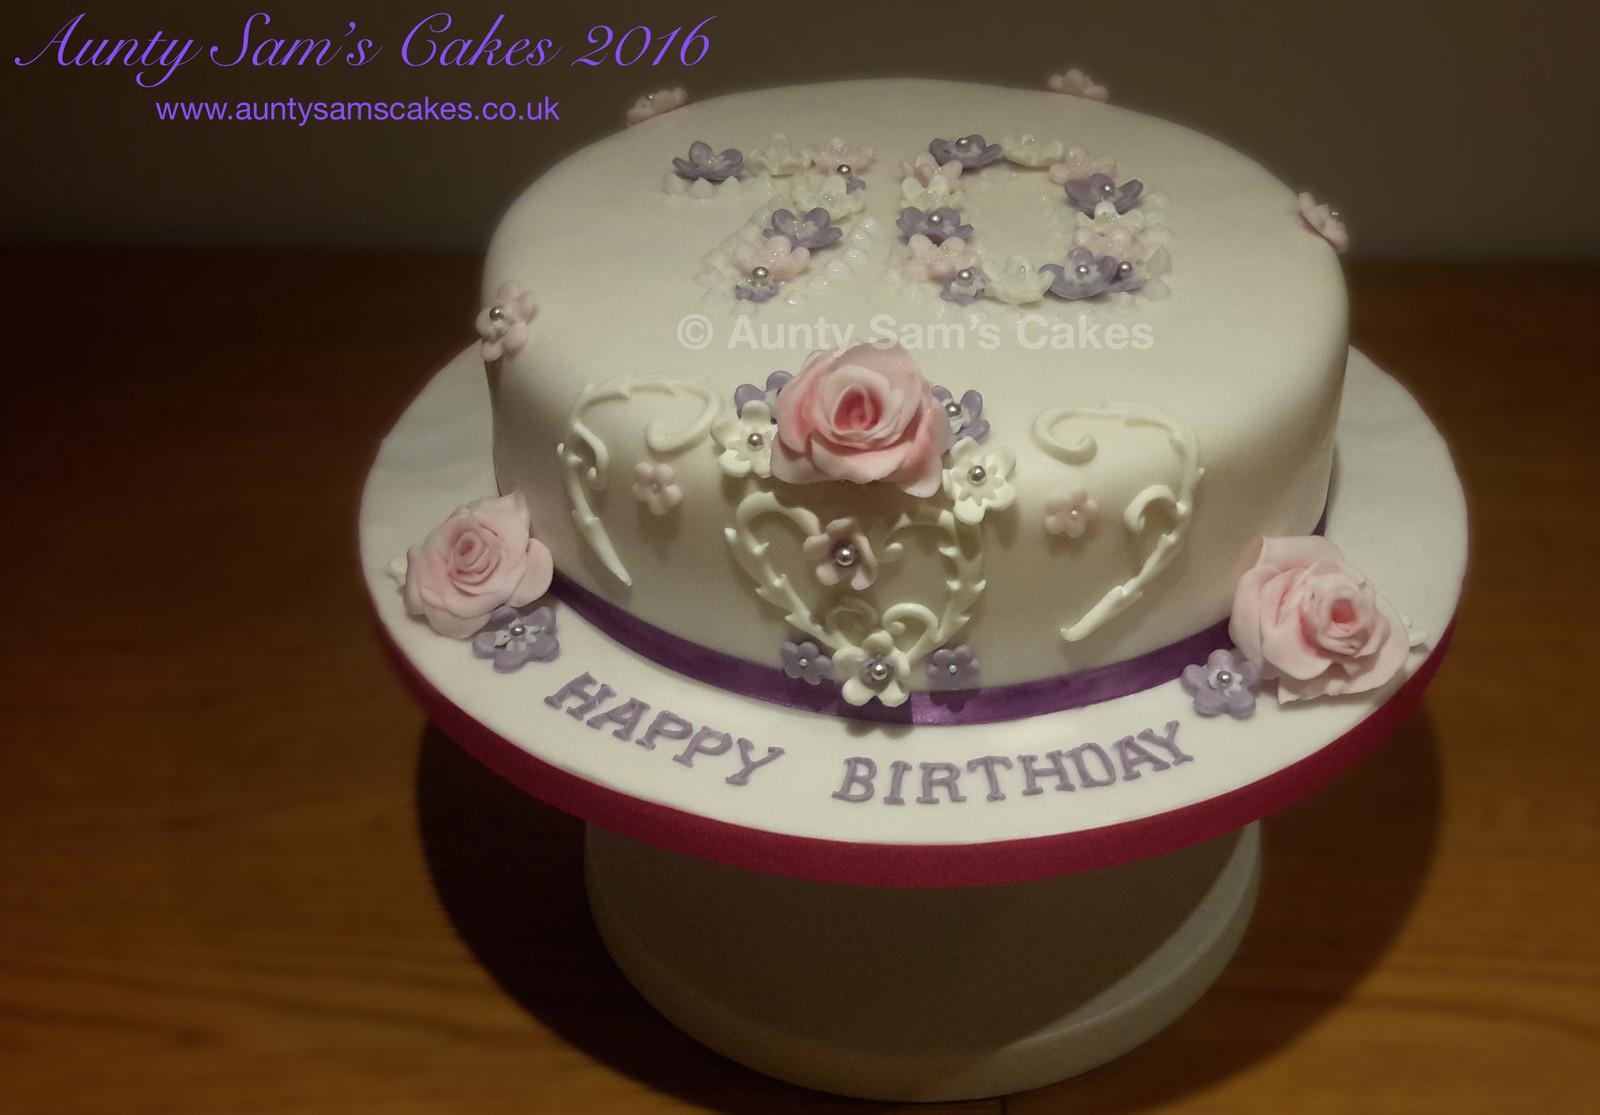 70th Birthday Cake 09 16 B